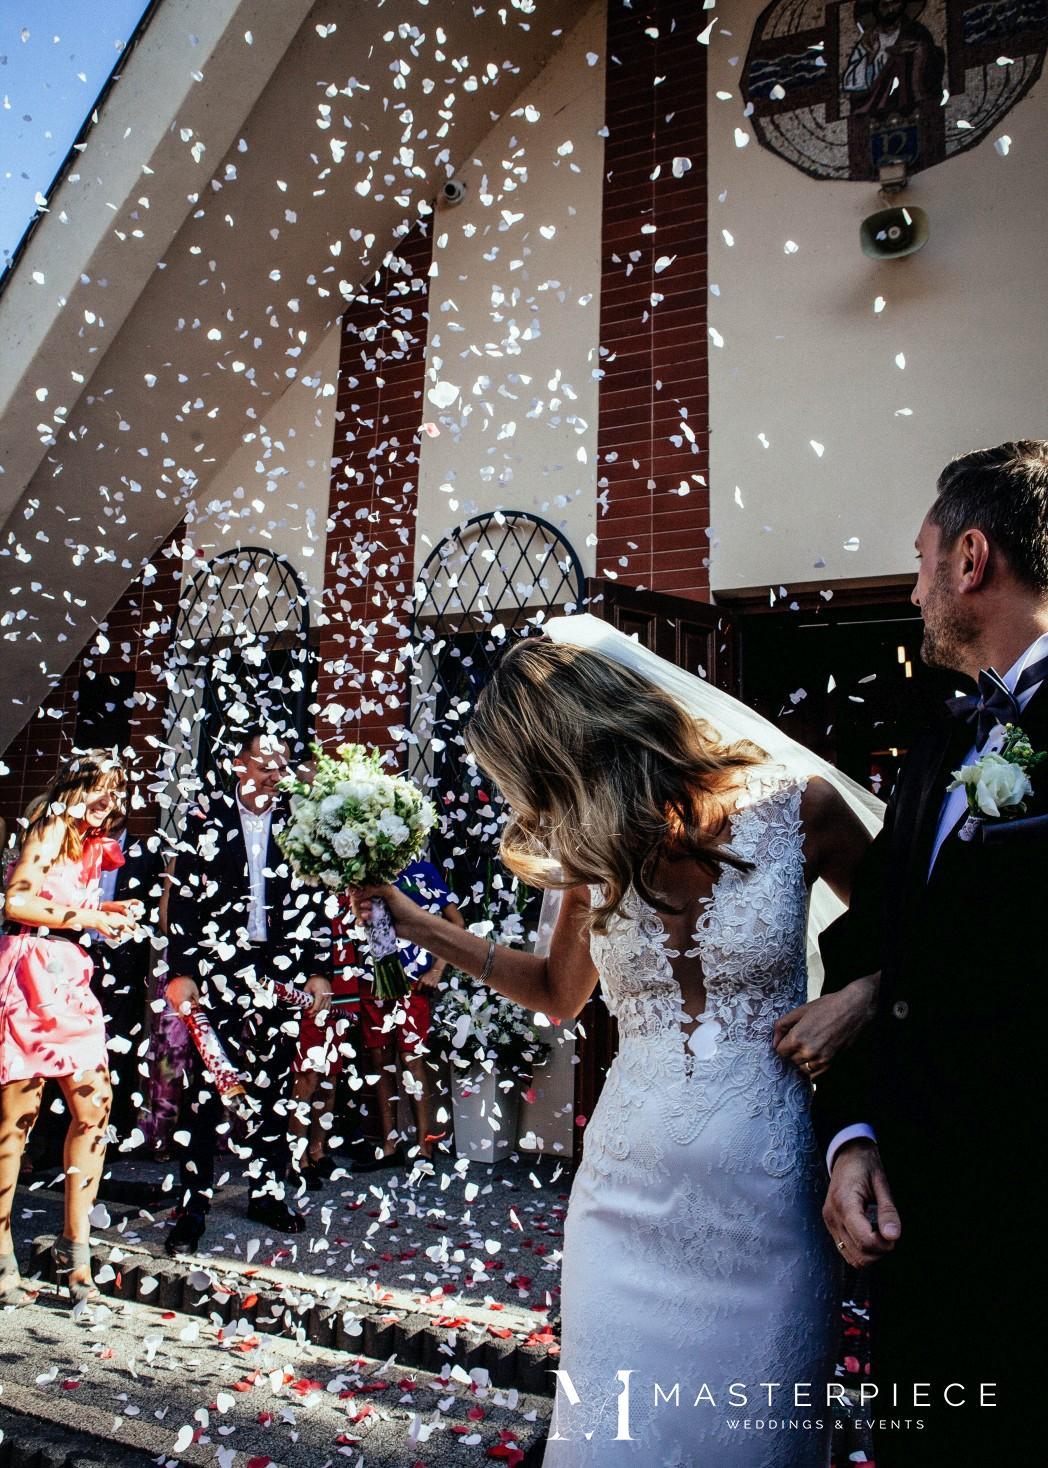 Masterpiece_Weddings_sluby_066